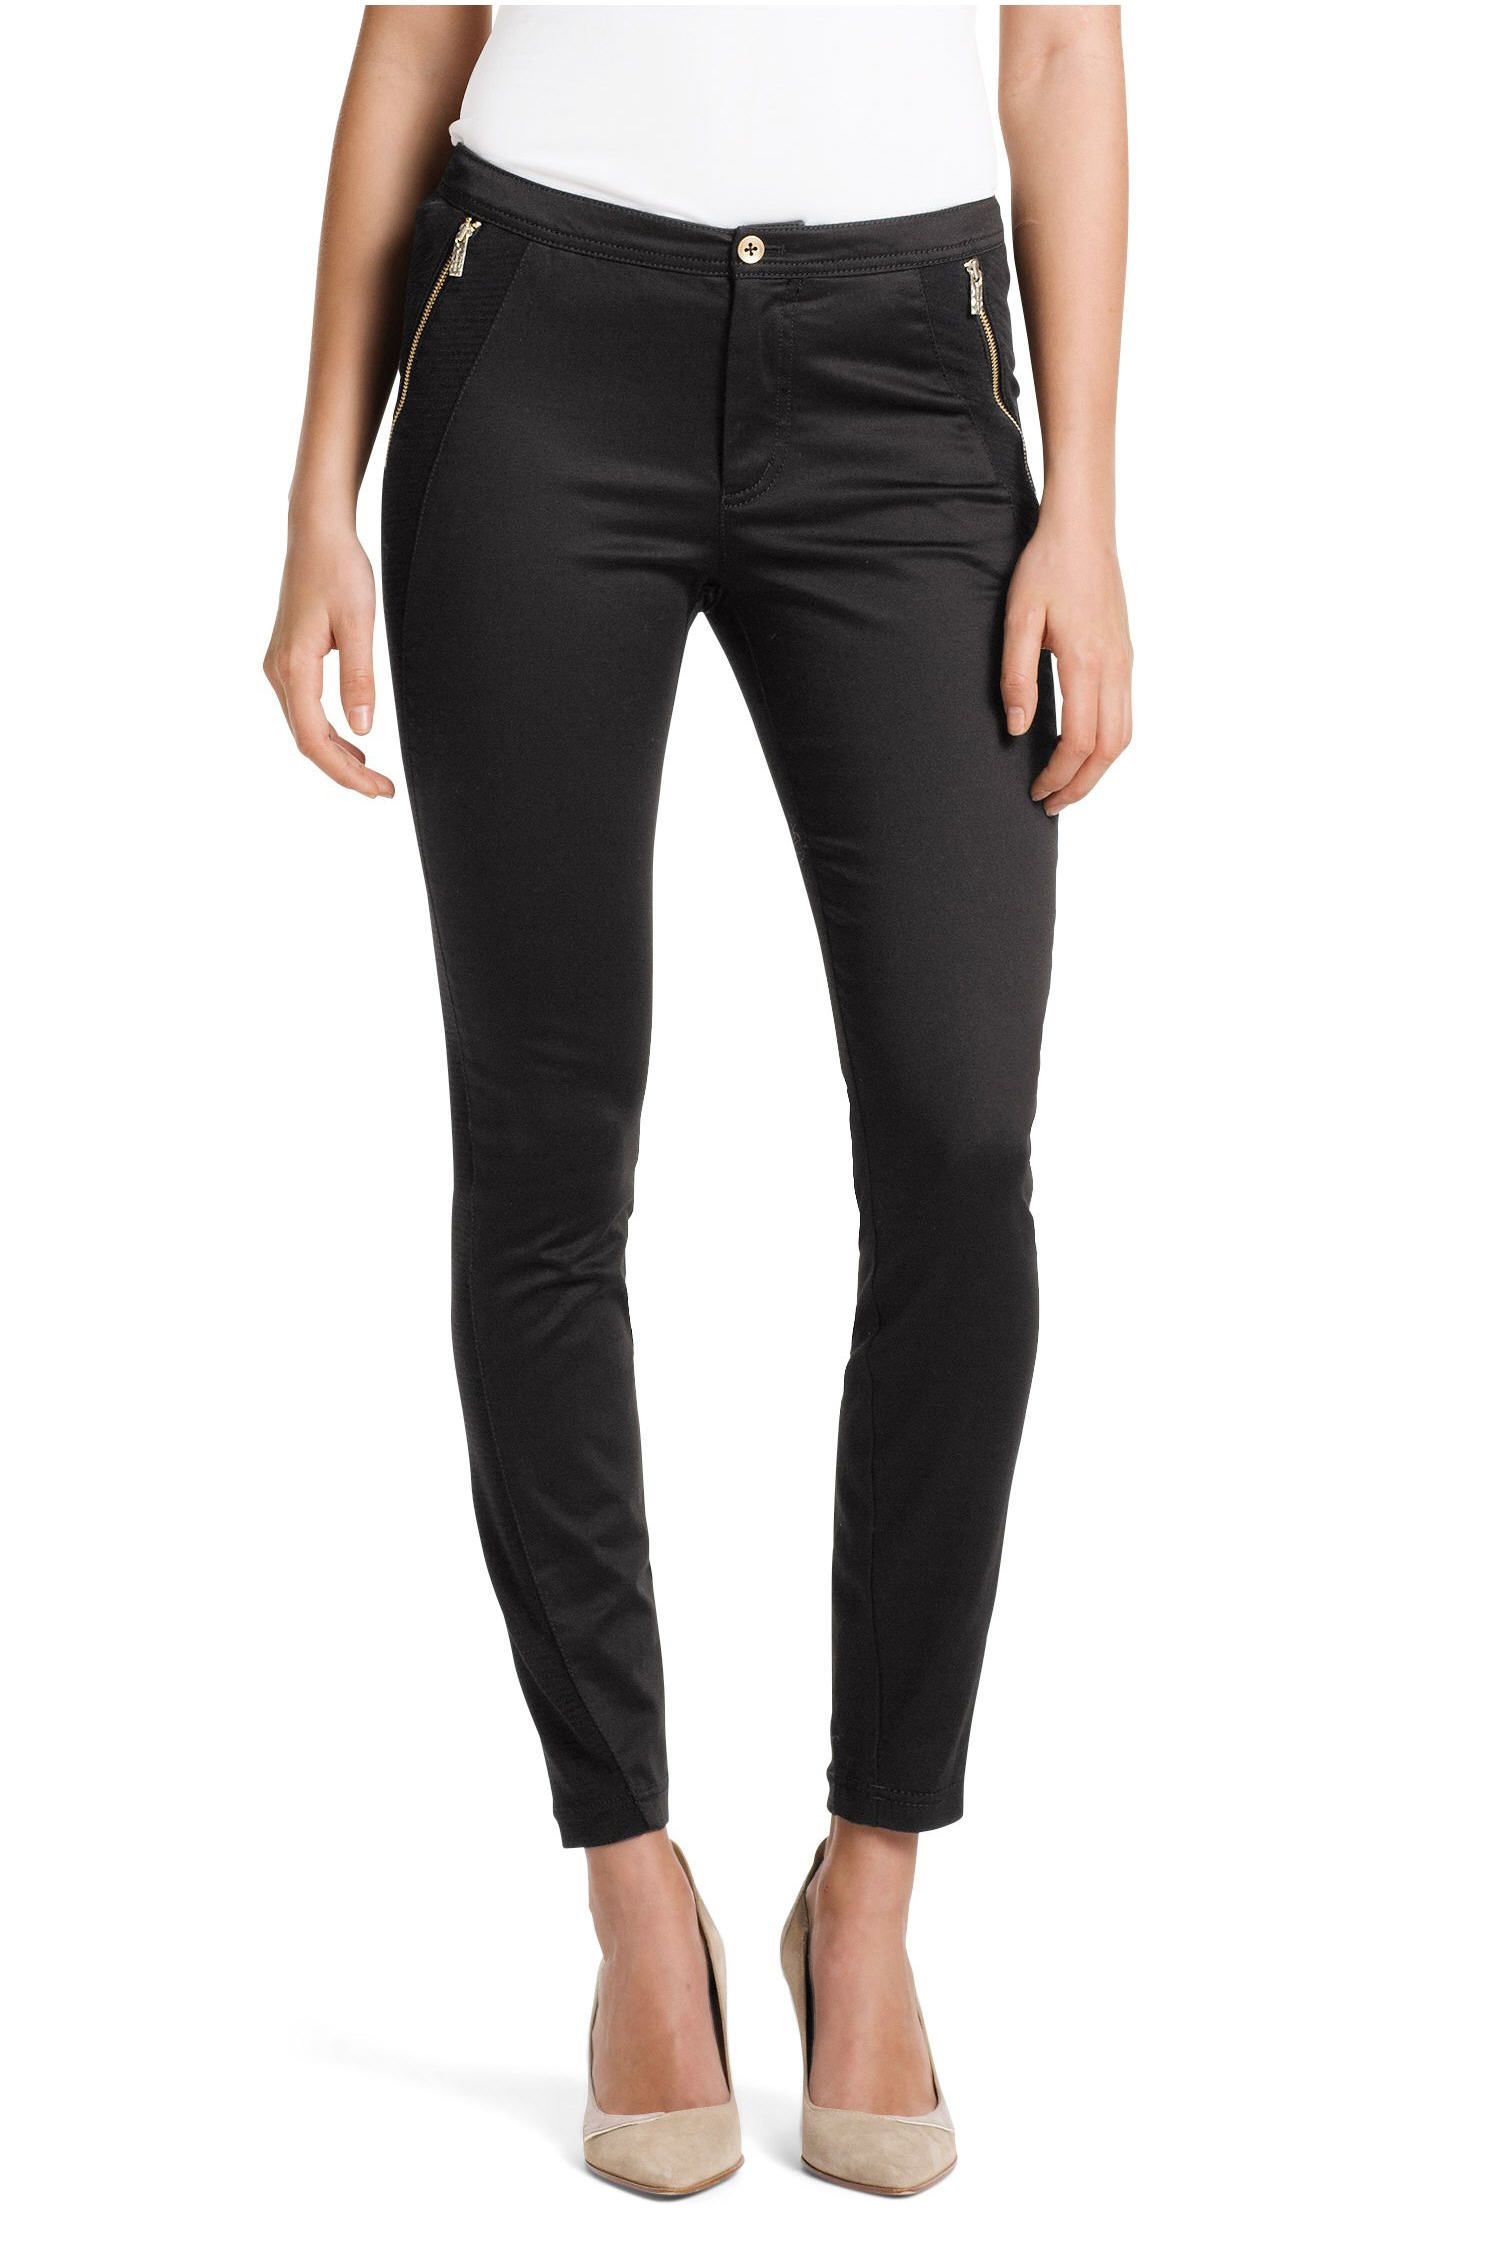 efdb99c06a05 BOSS Orange Pantalon Skinny Fit Soloca-W - Pantalon Femme Hugo Boss